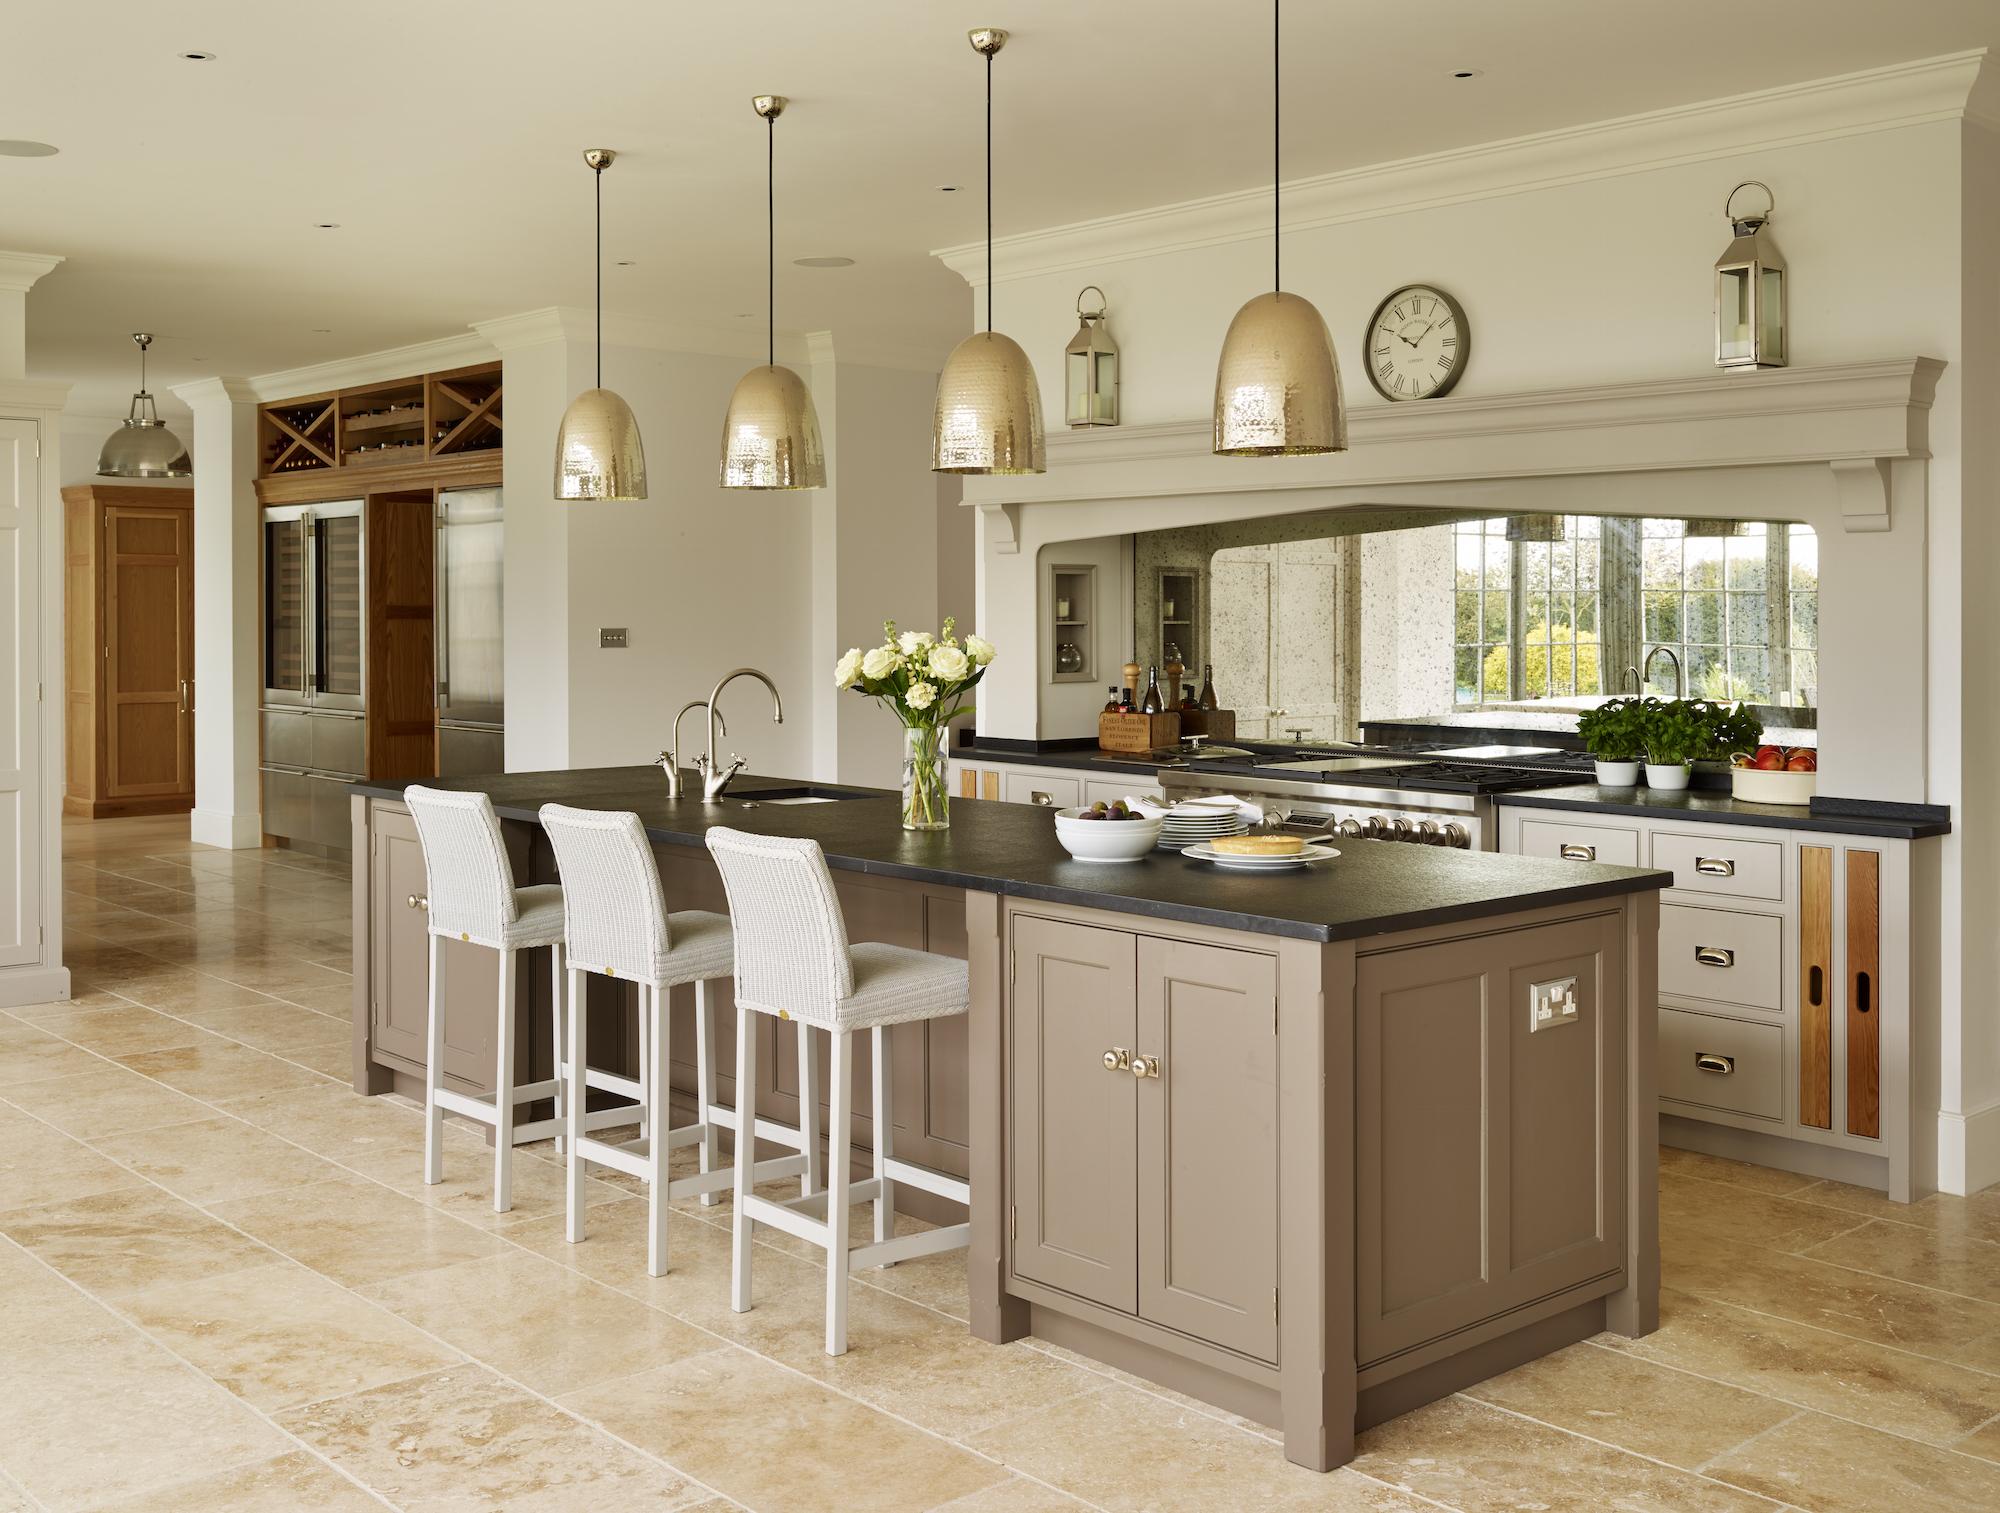 kitchen design ideas TNWUTLE